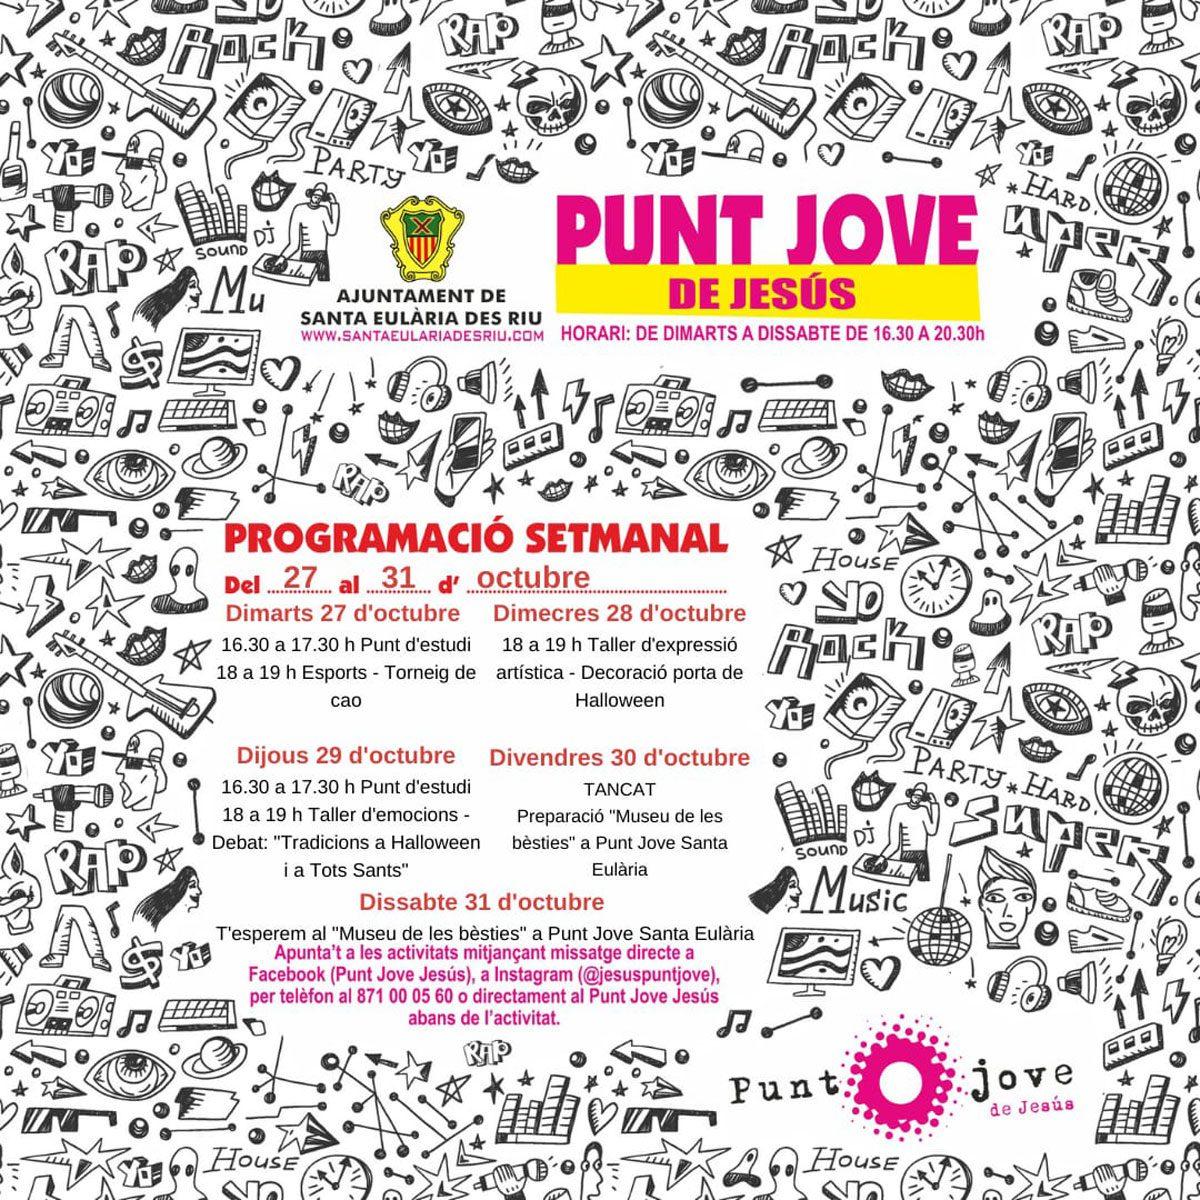 punt-jove-jesus-ibiza-2020-program-halloween-welcometoibiza